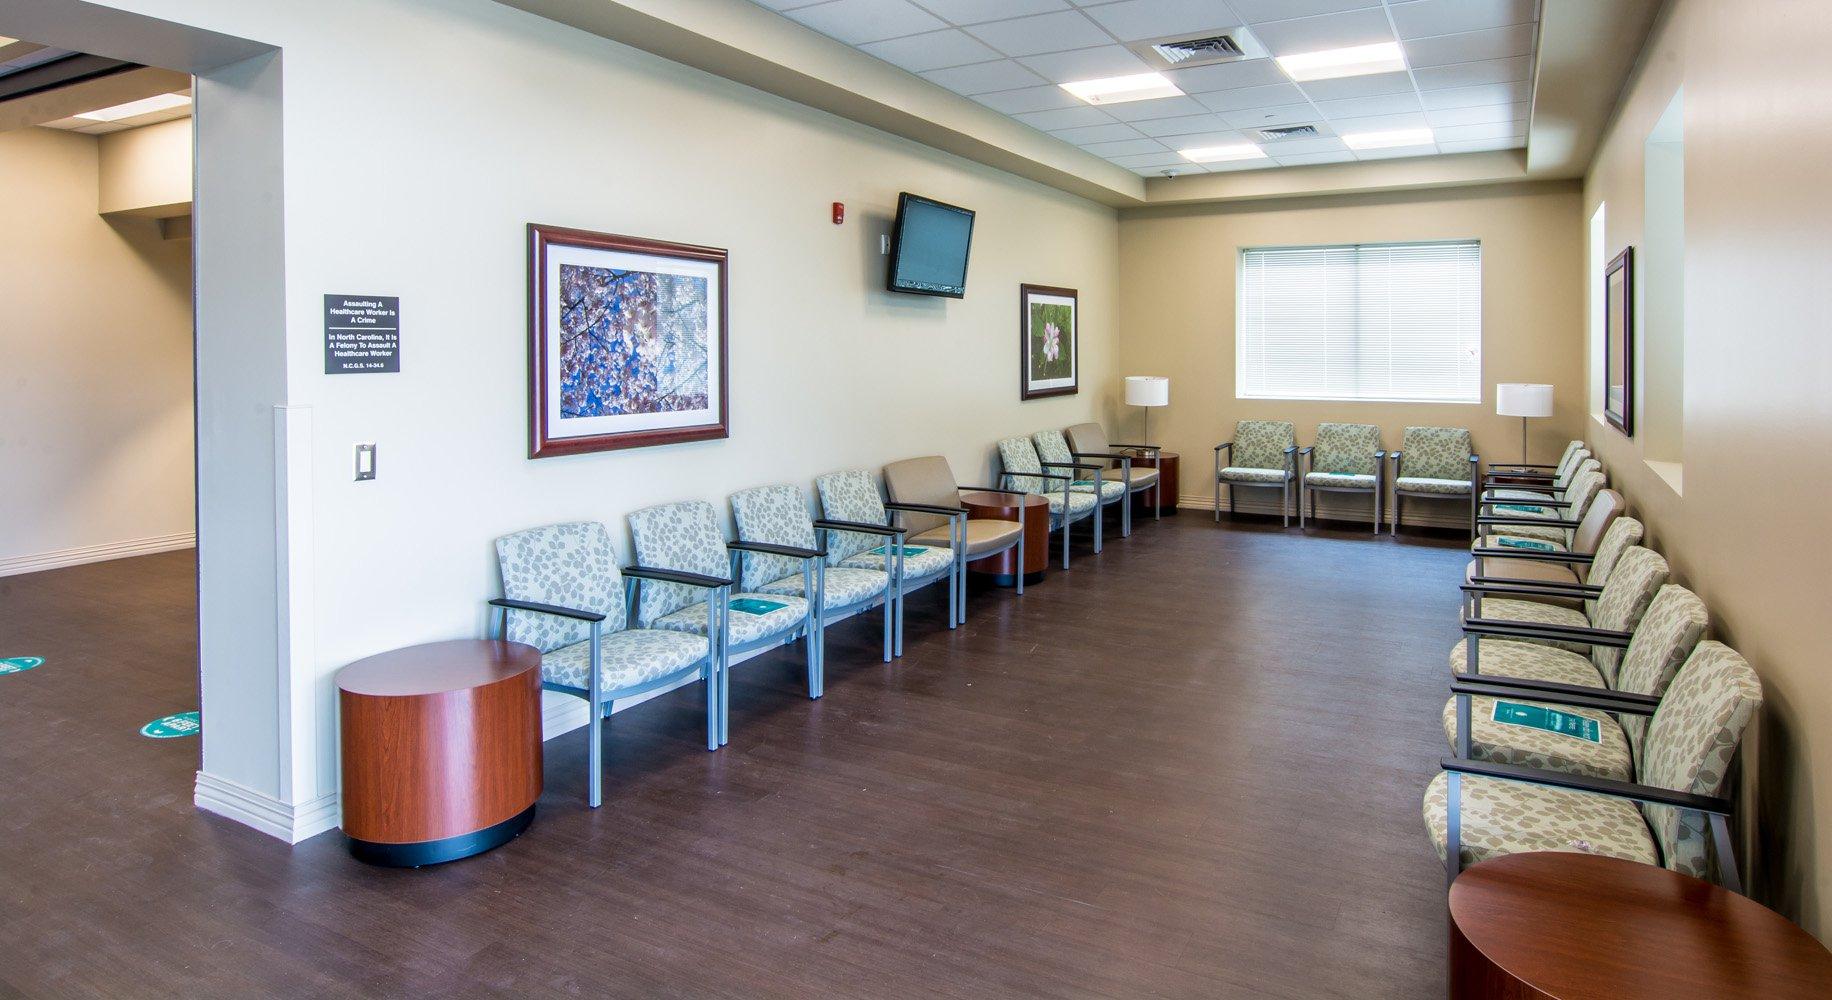 Carolinas Healthcare System Blue Ridge waiting area